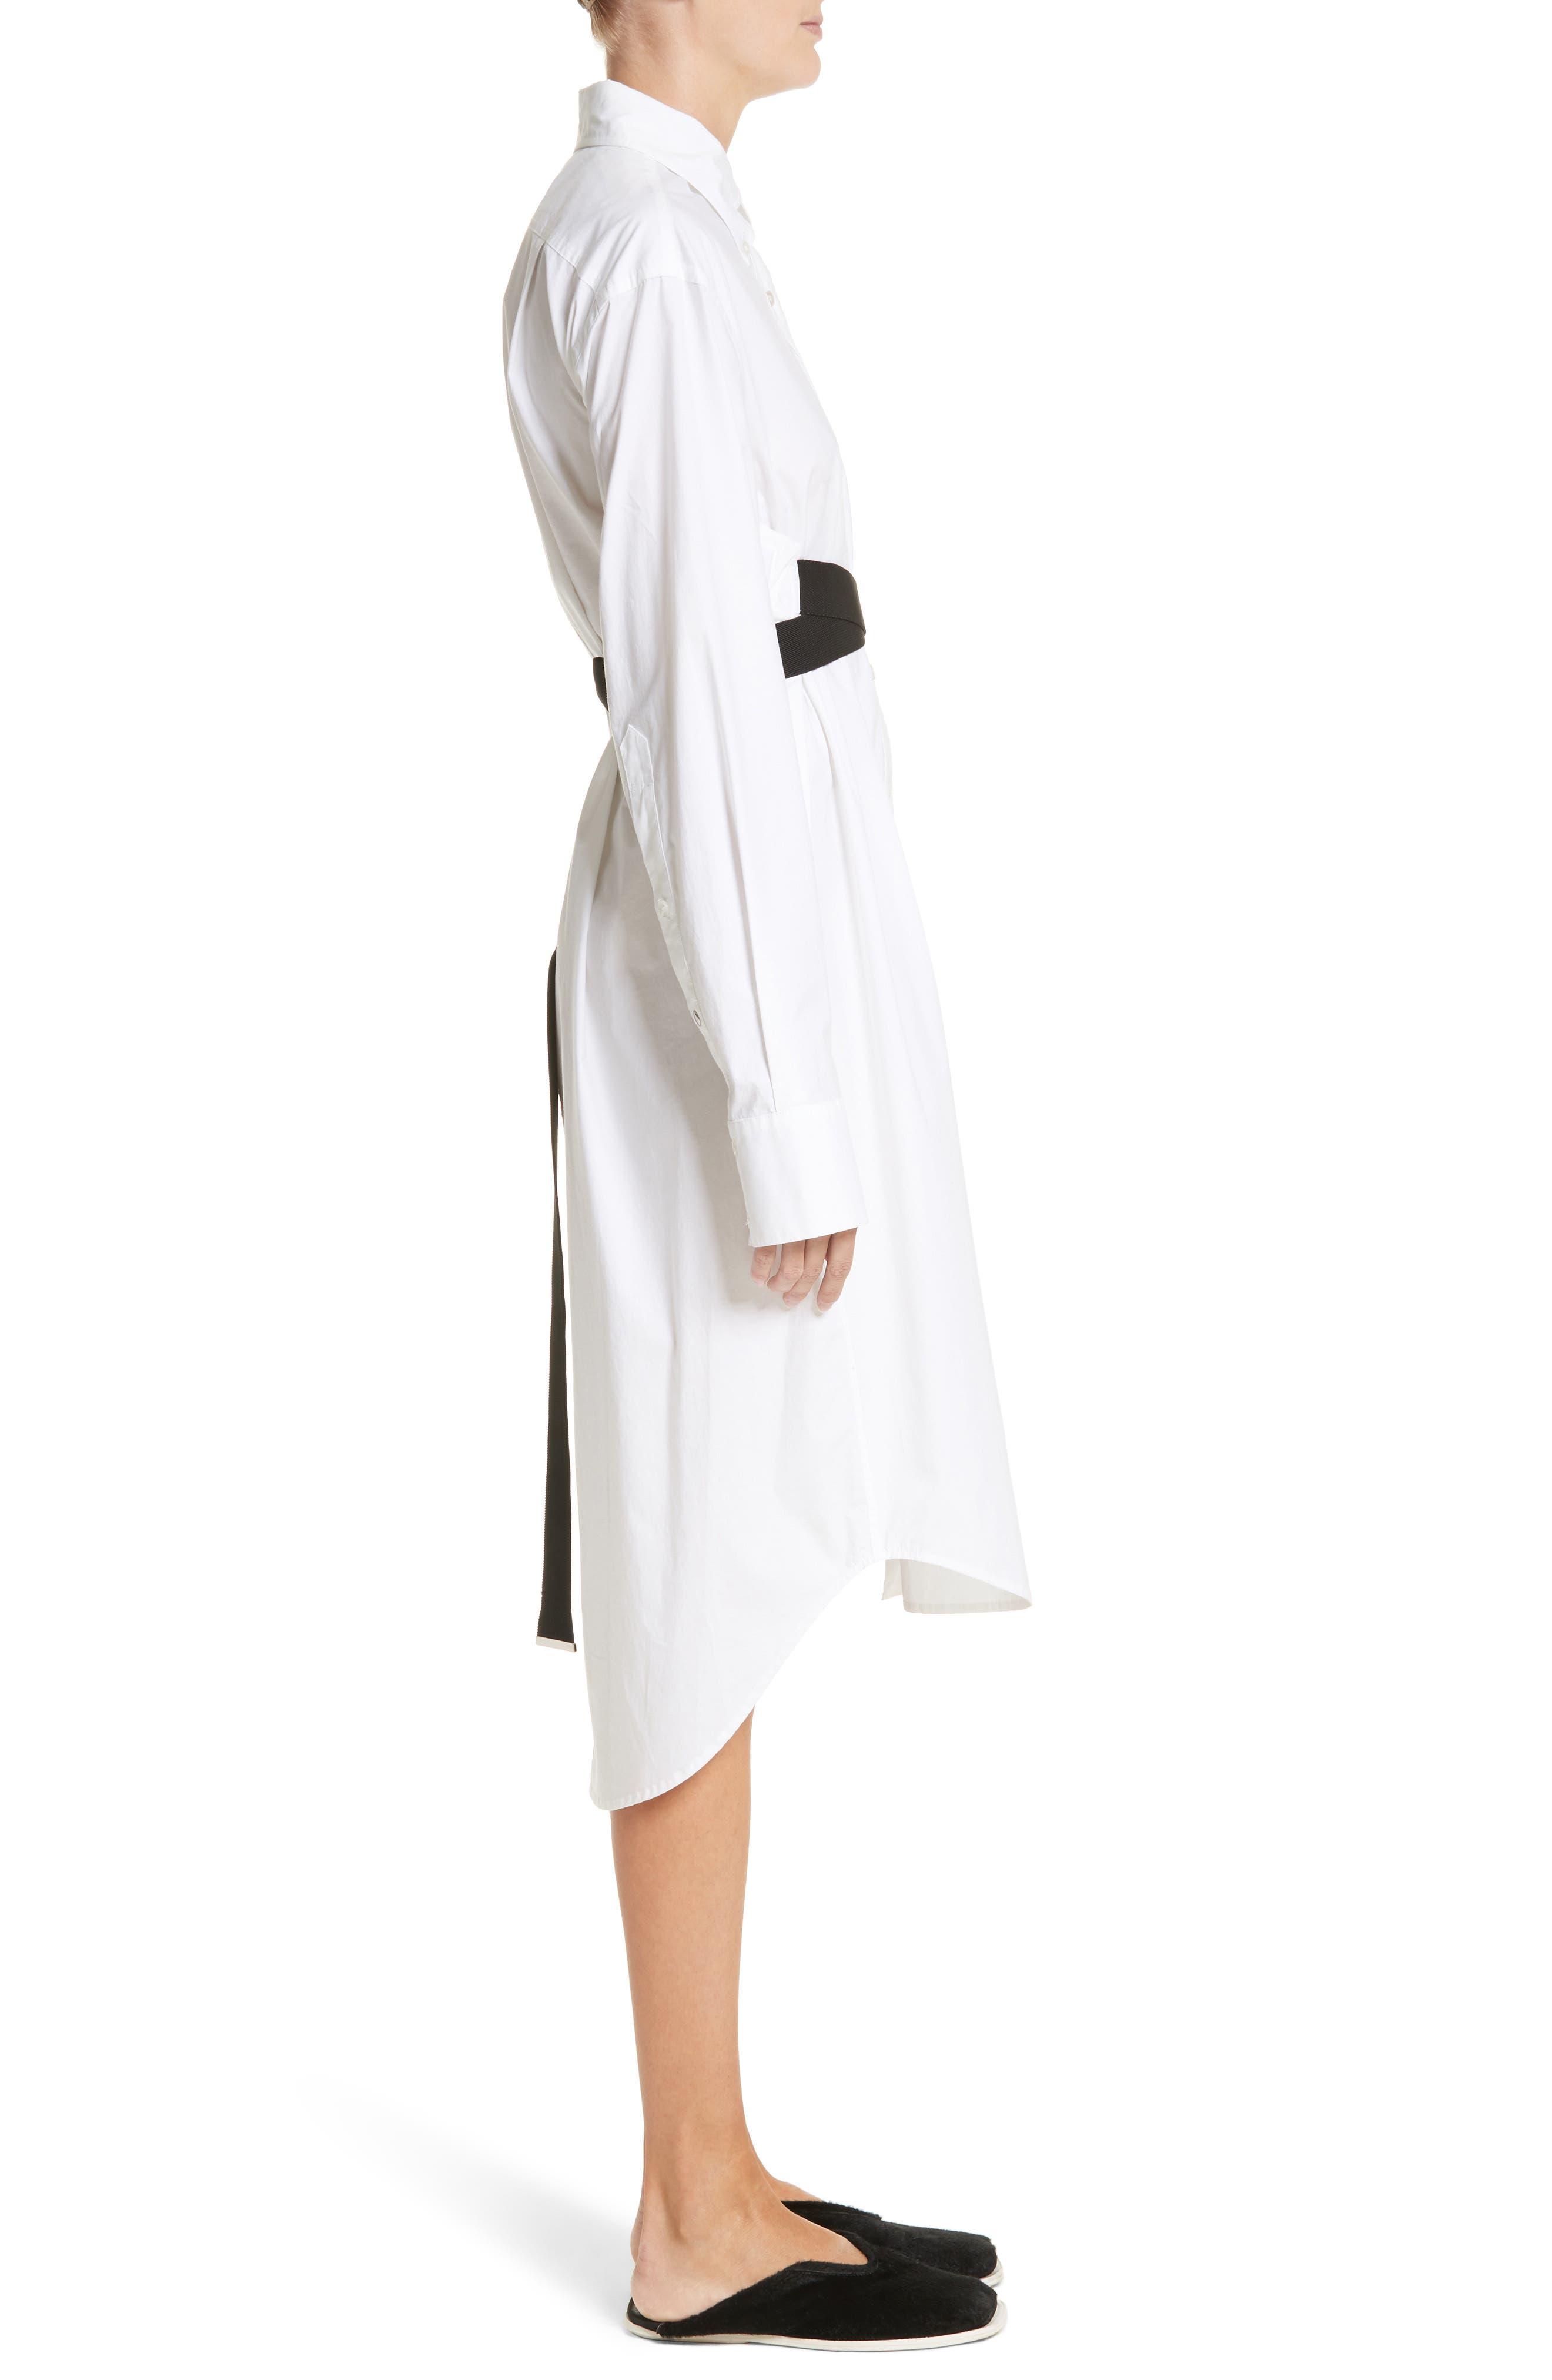 PSWL Belted Poplin Shirtdress,                             Alternate thumbnail 3, color,                             Optic White/ Black